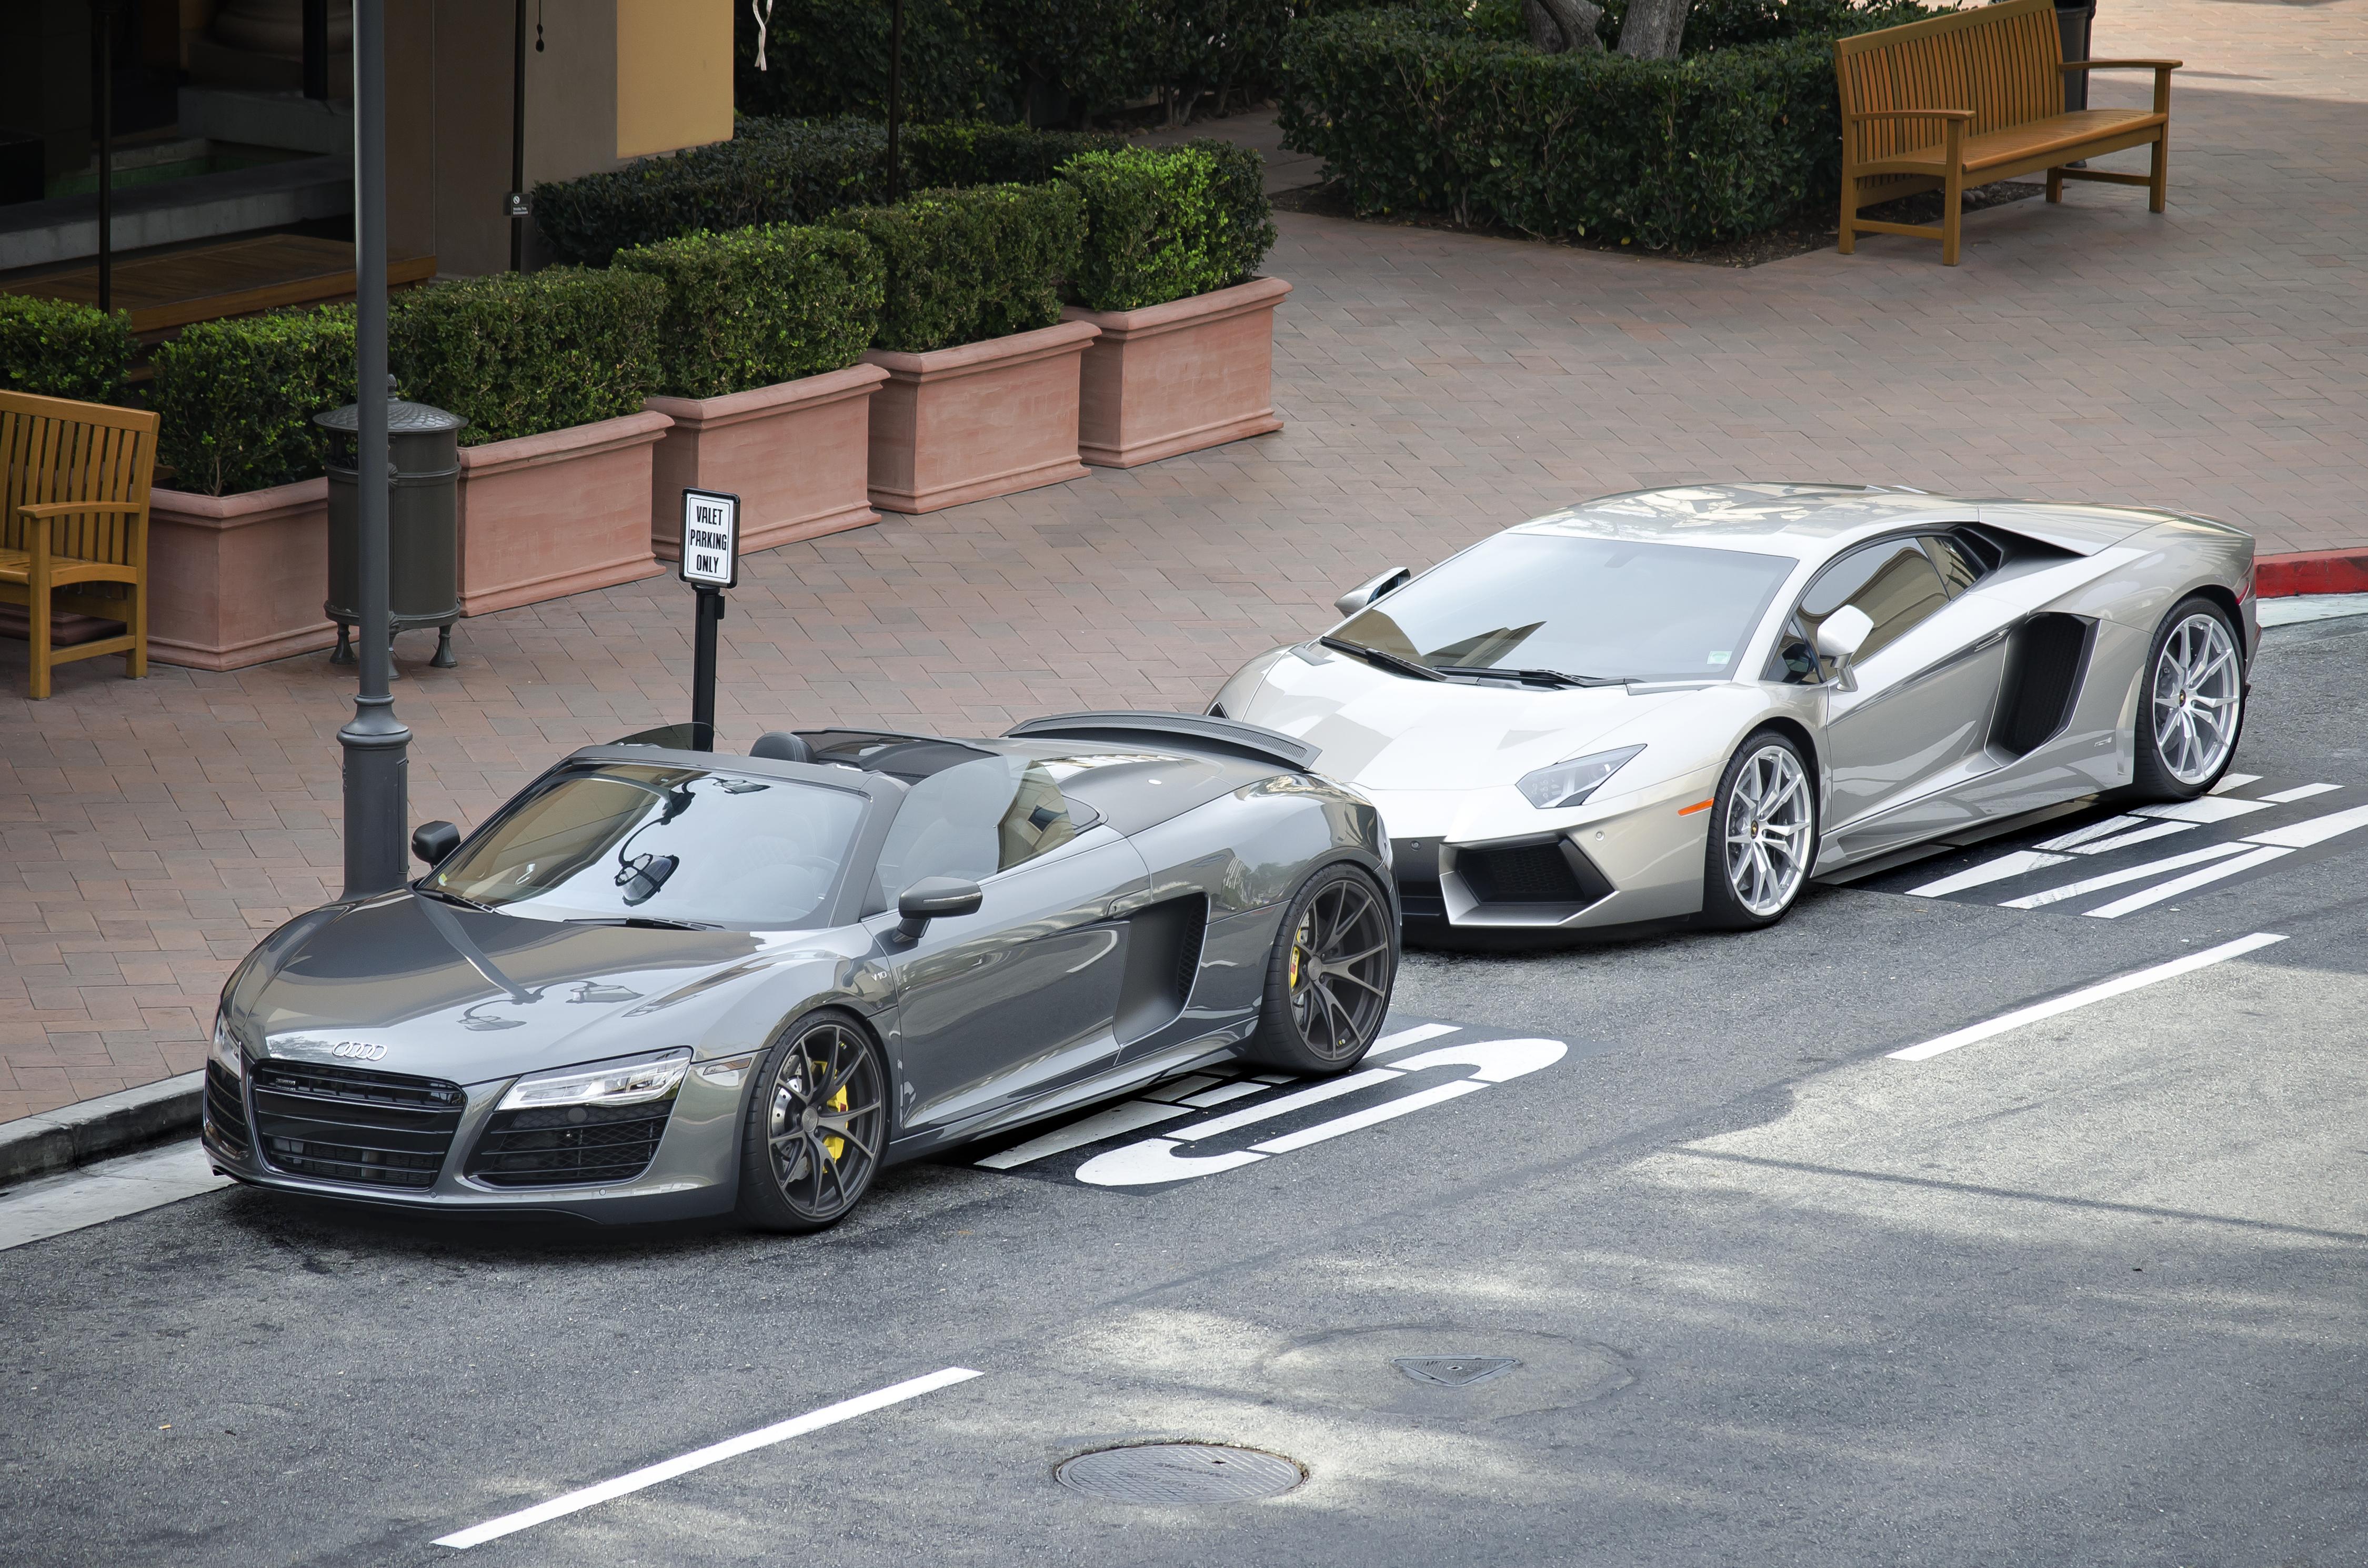 Lamborghini Aventador Spyder >> File:Audi R8 Spyder V10 and Lamborghini Aventador (12230267074).jpg